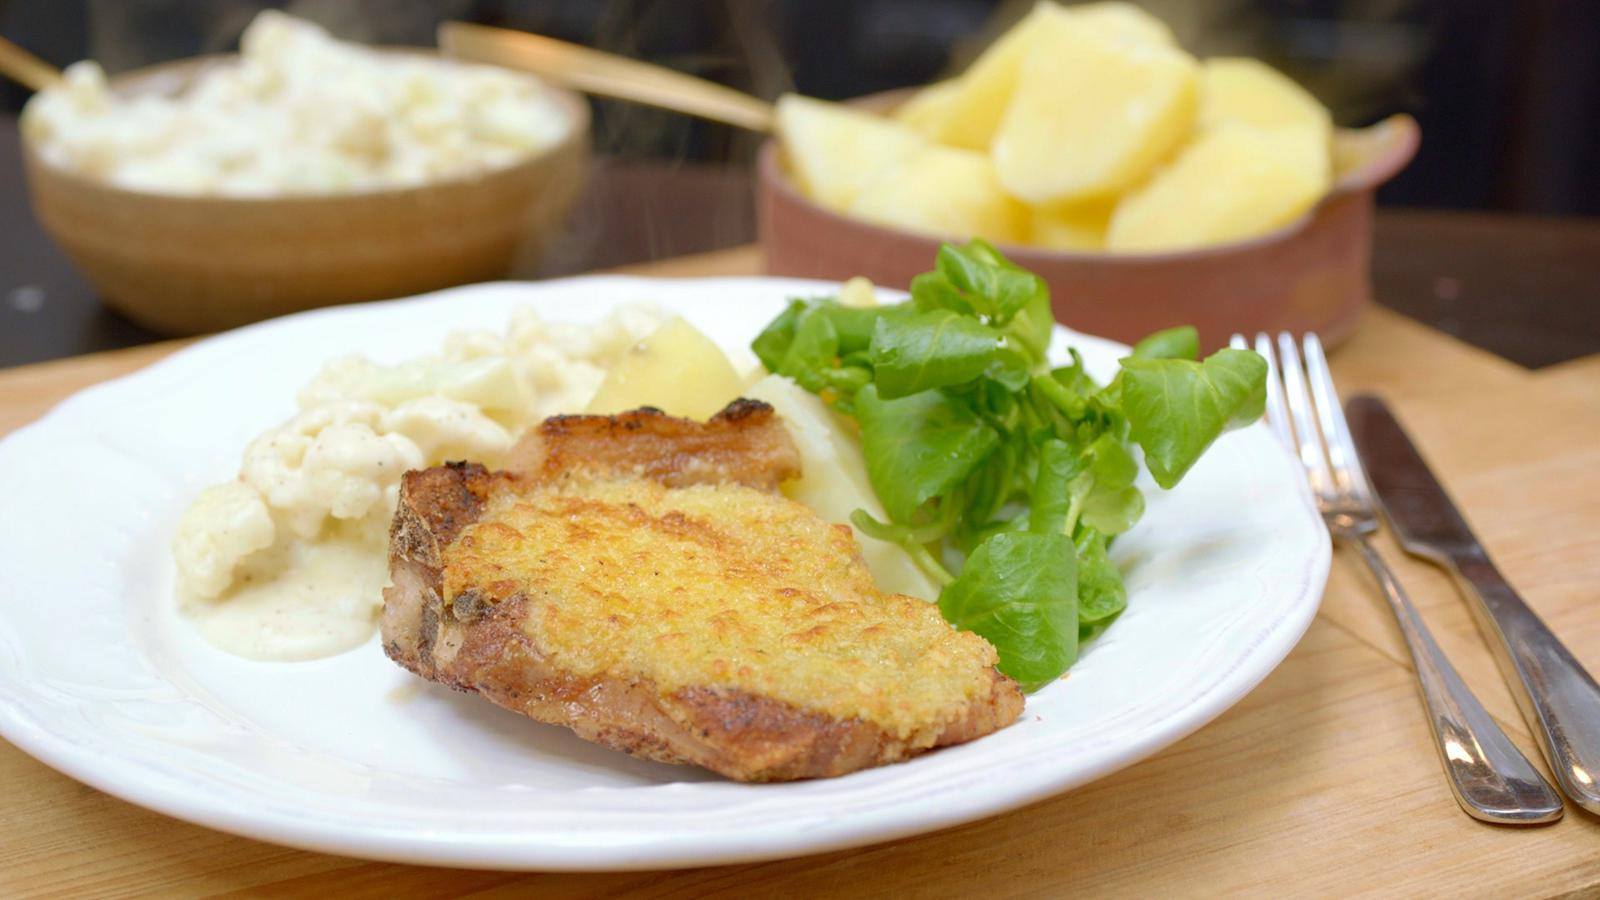 Kotelet met bloemkool in witte saus en gekookte aardappelen